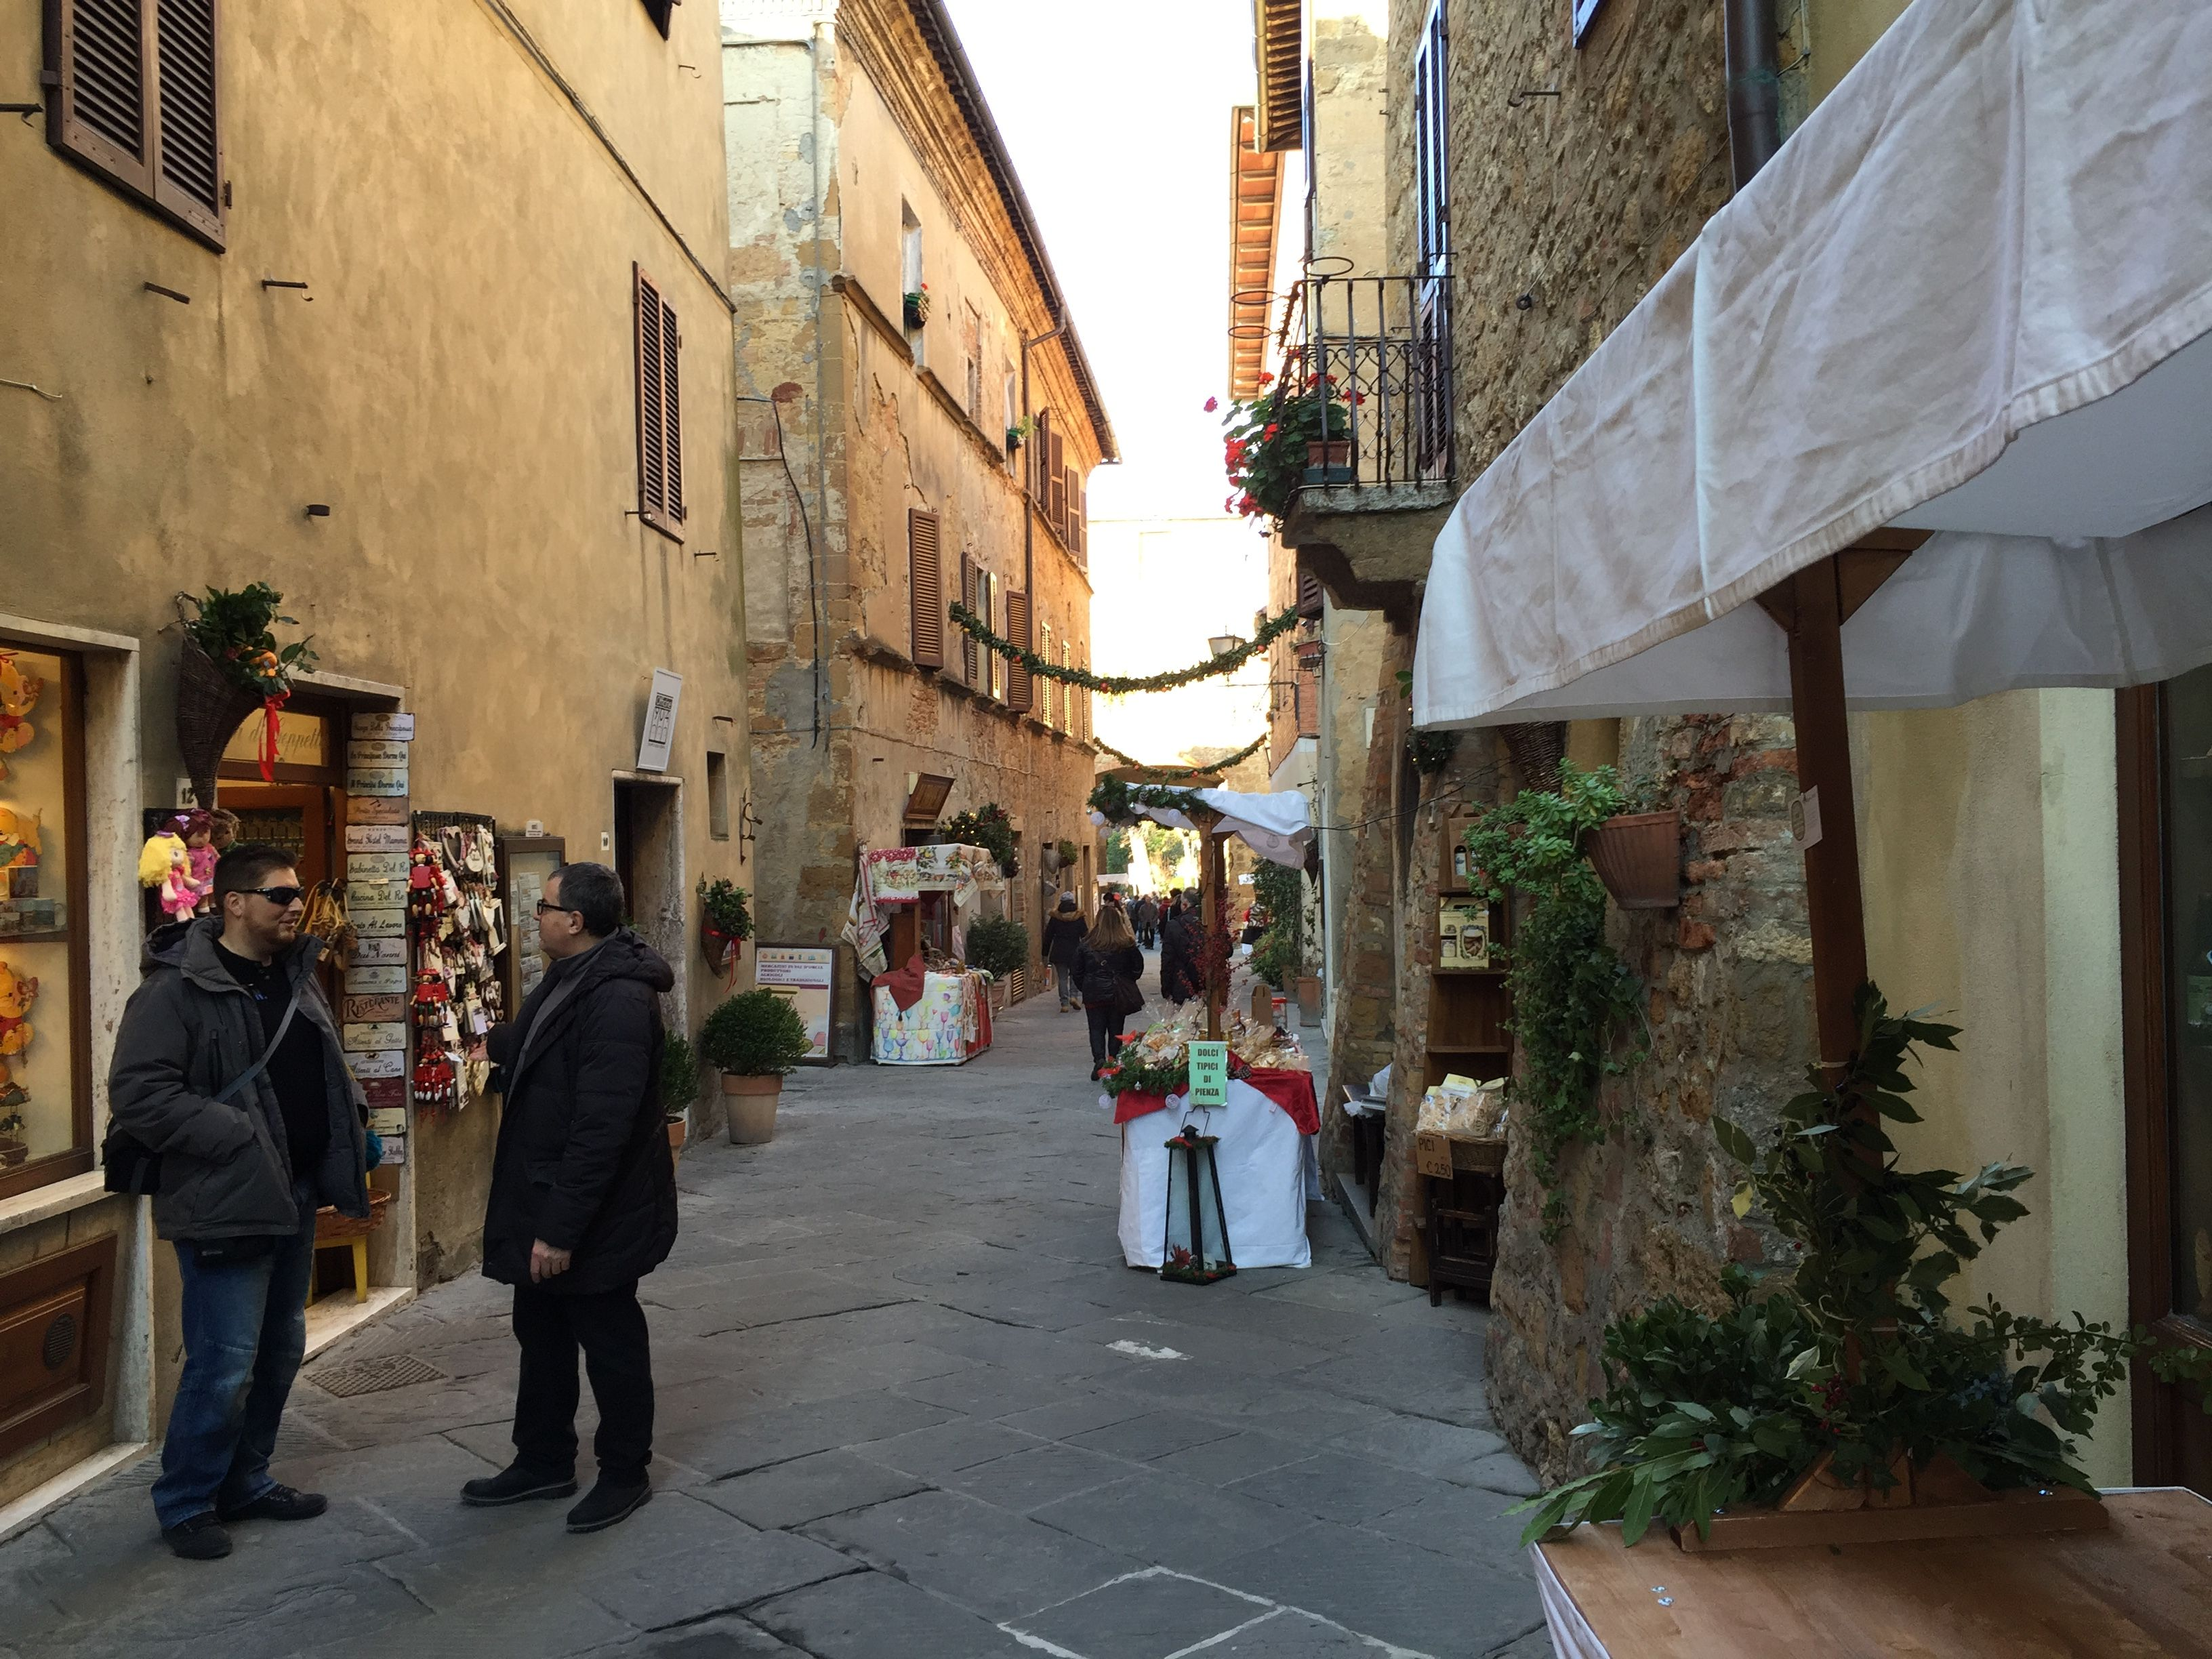 Corso Rossellino, the main street of Pienza